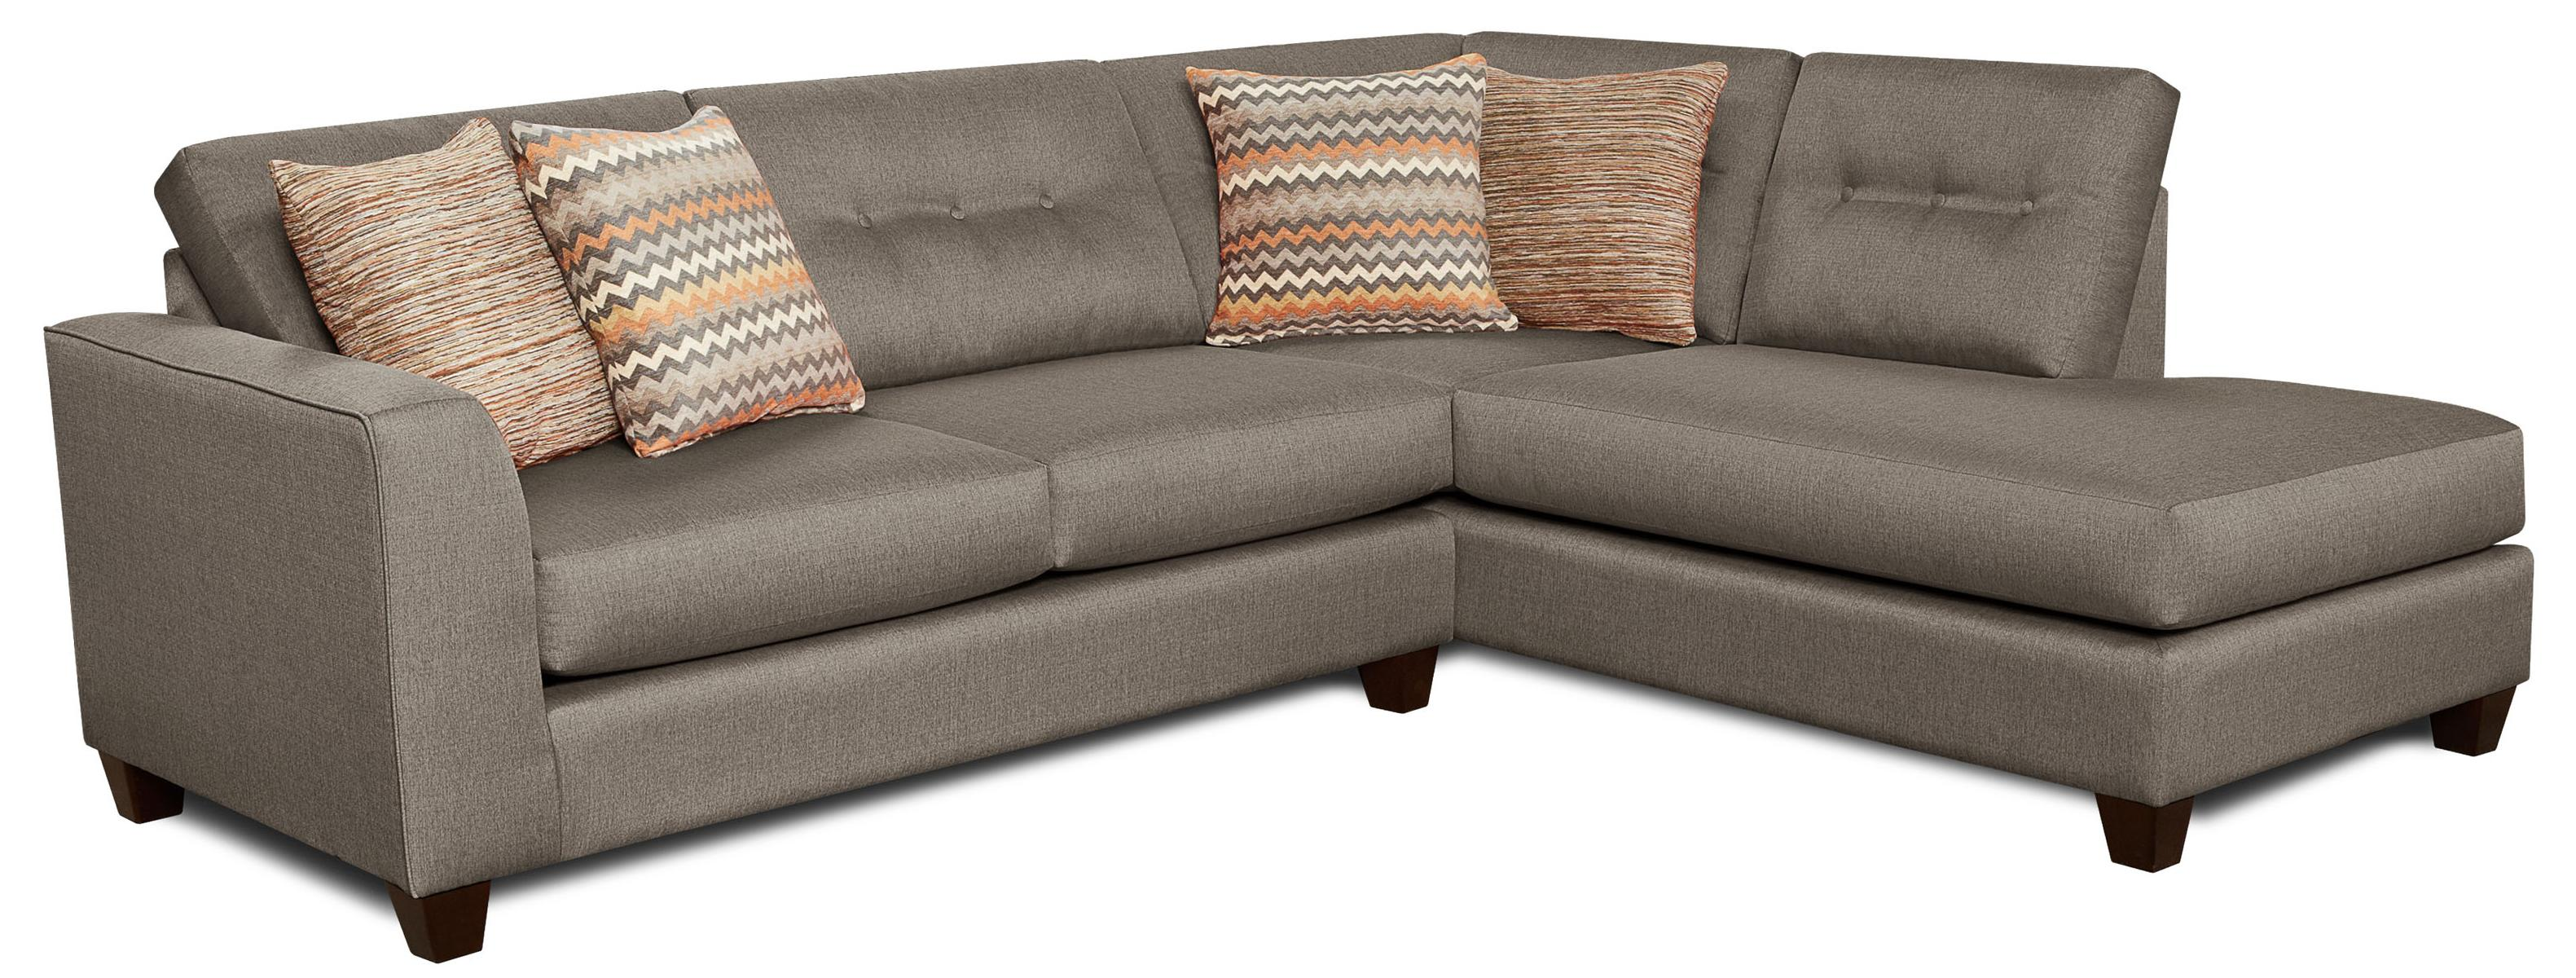 Fusion Furniture Fandango Mocha Sectional Sofa - Item Number: 1515+1516 Mocha